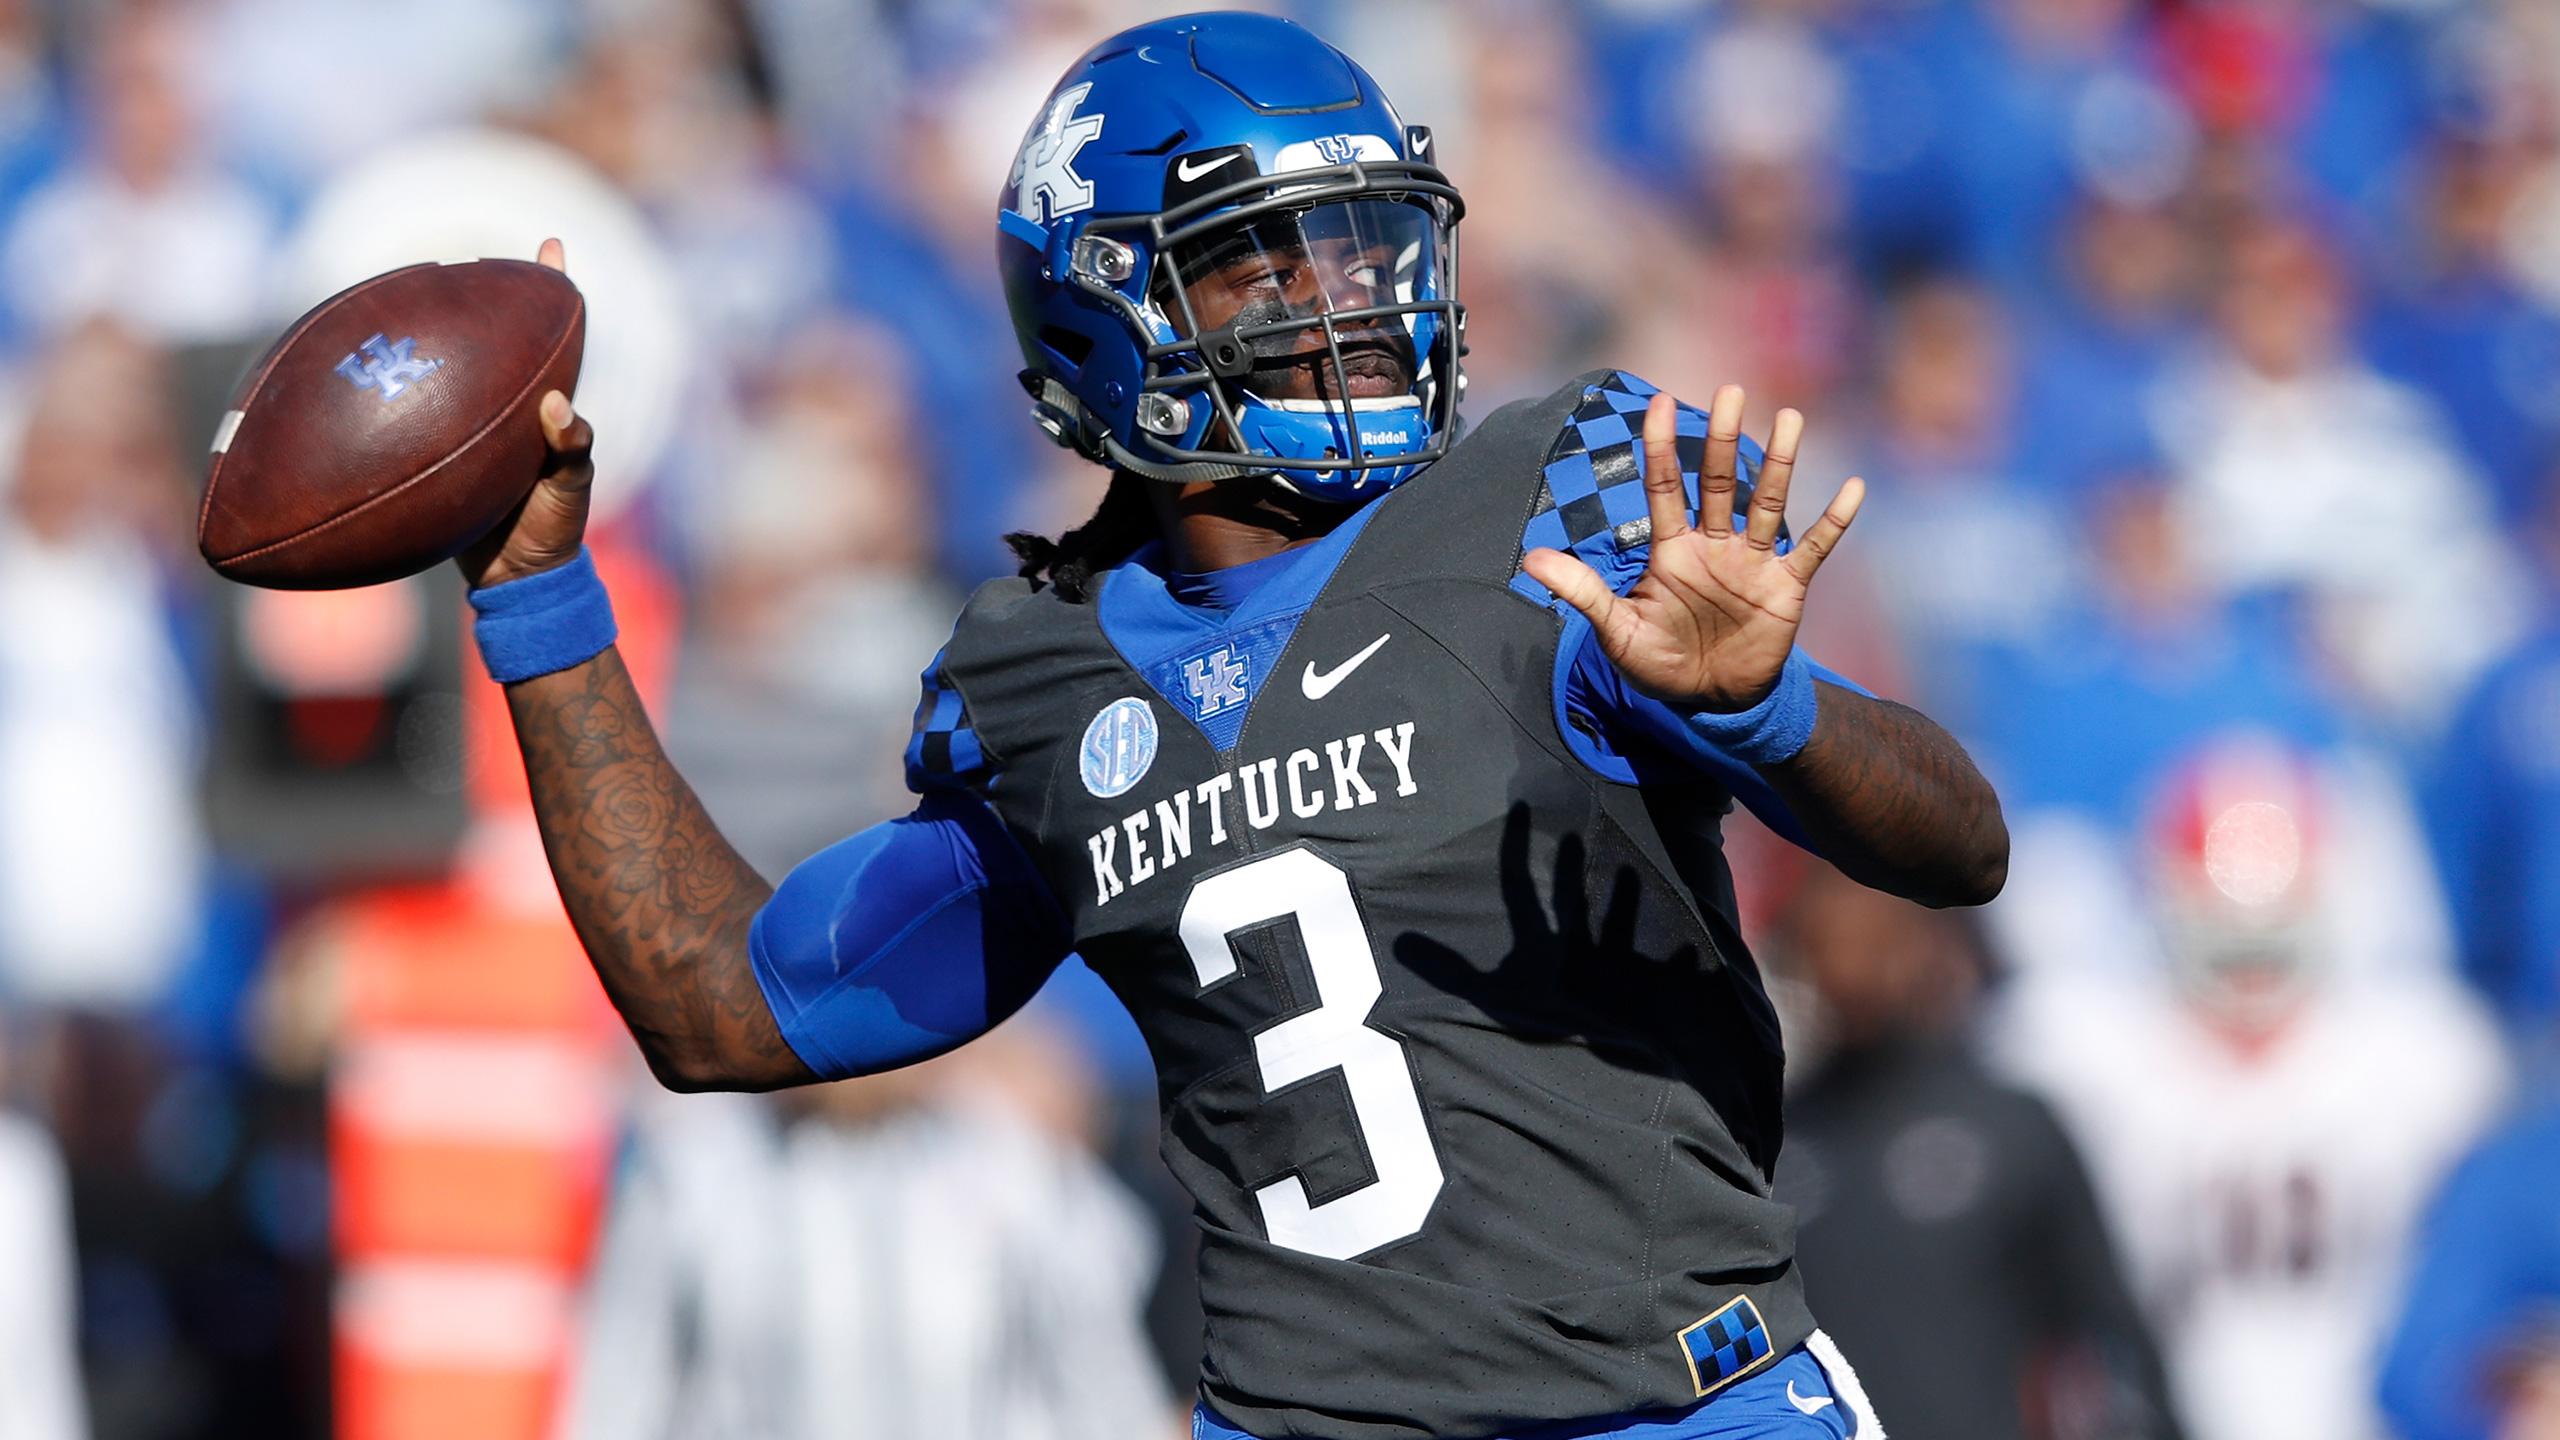 #11 Kentucky vs. Tennessee (Football) (re-air)